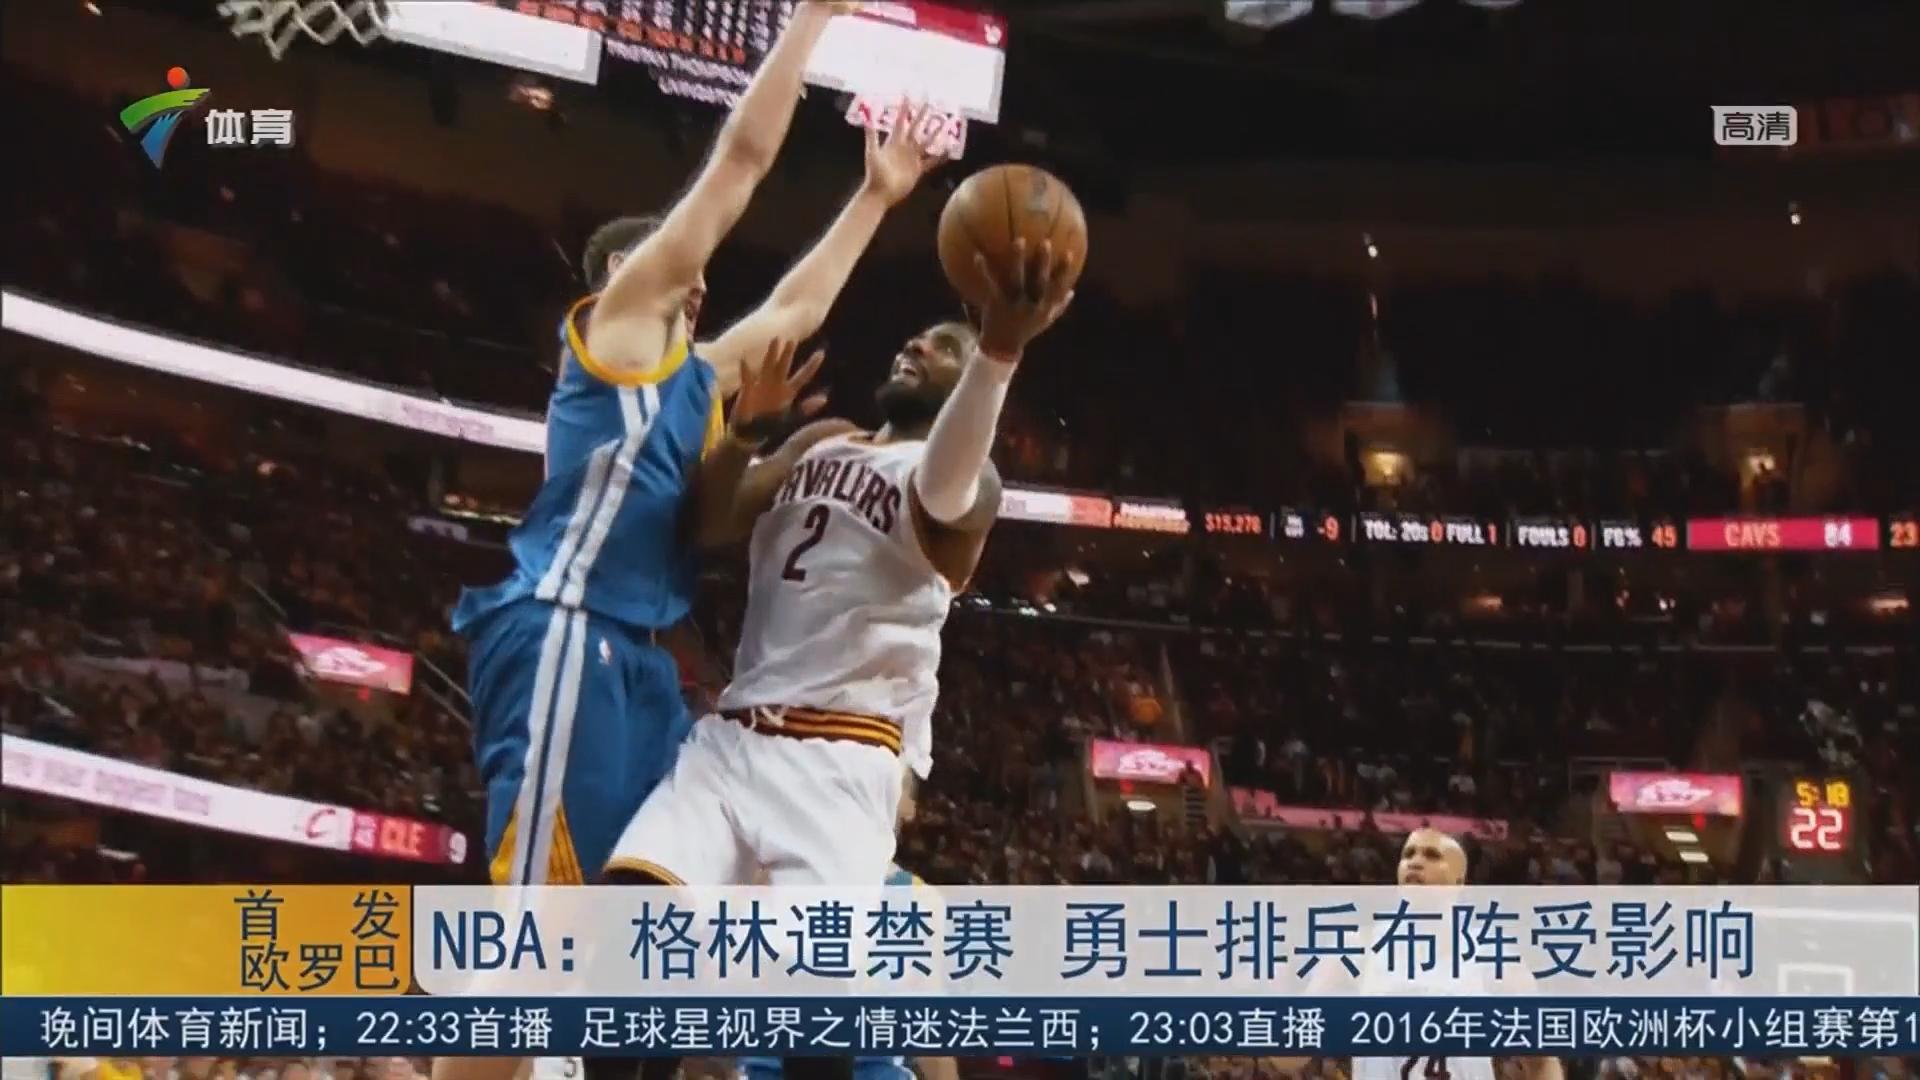 NBA:格林遭禁赛 勇士排兵布阵受影响